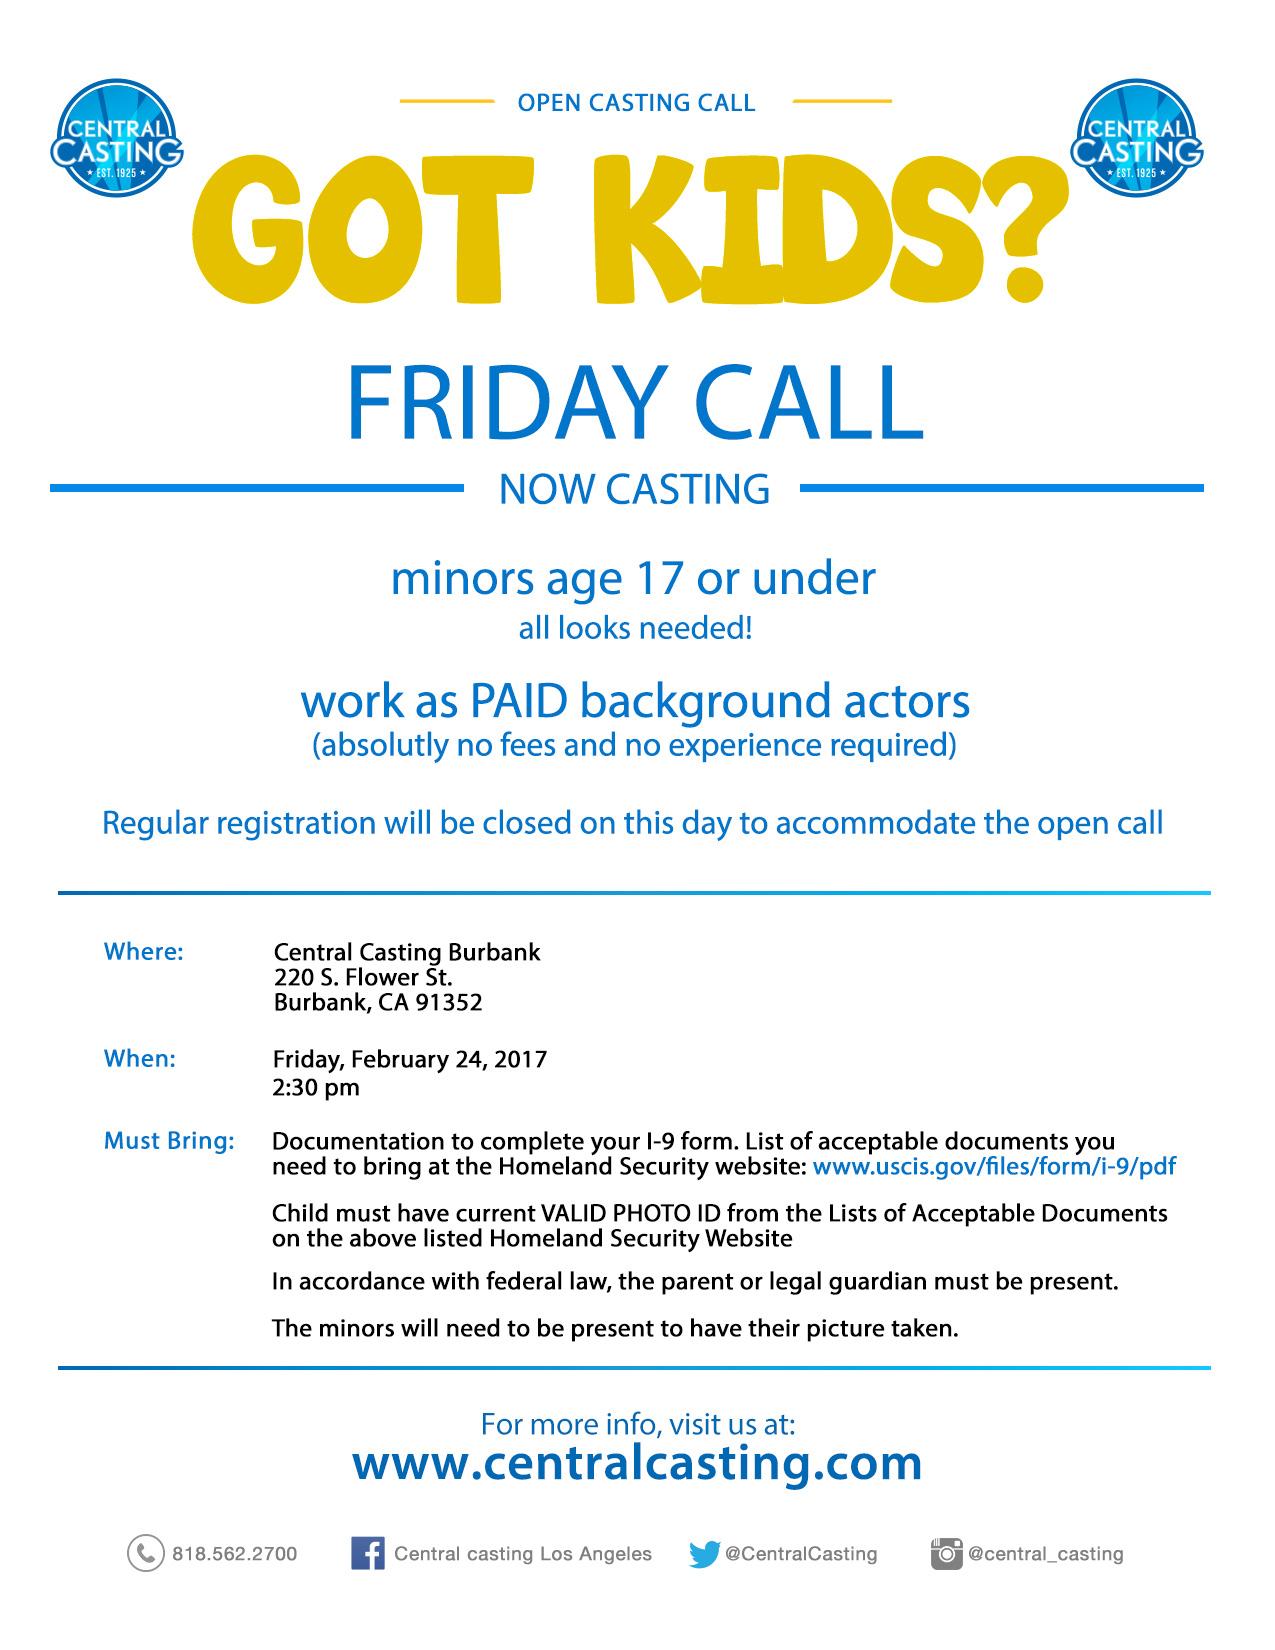 kids-casting-call-LA